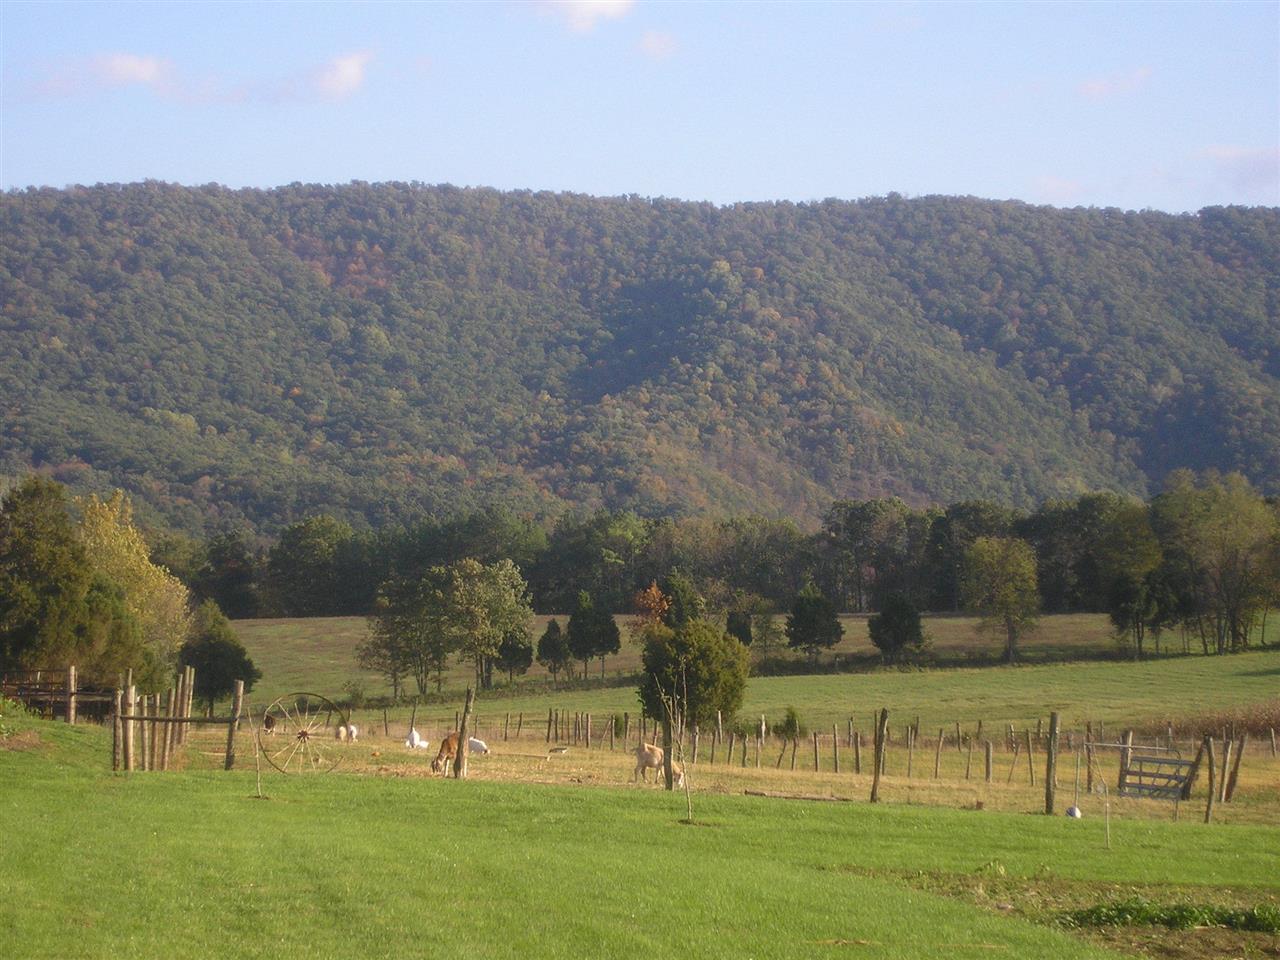 Toms Brook, VA - mountain ridge